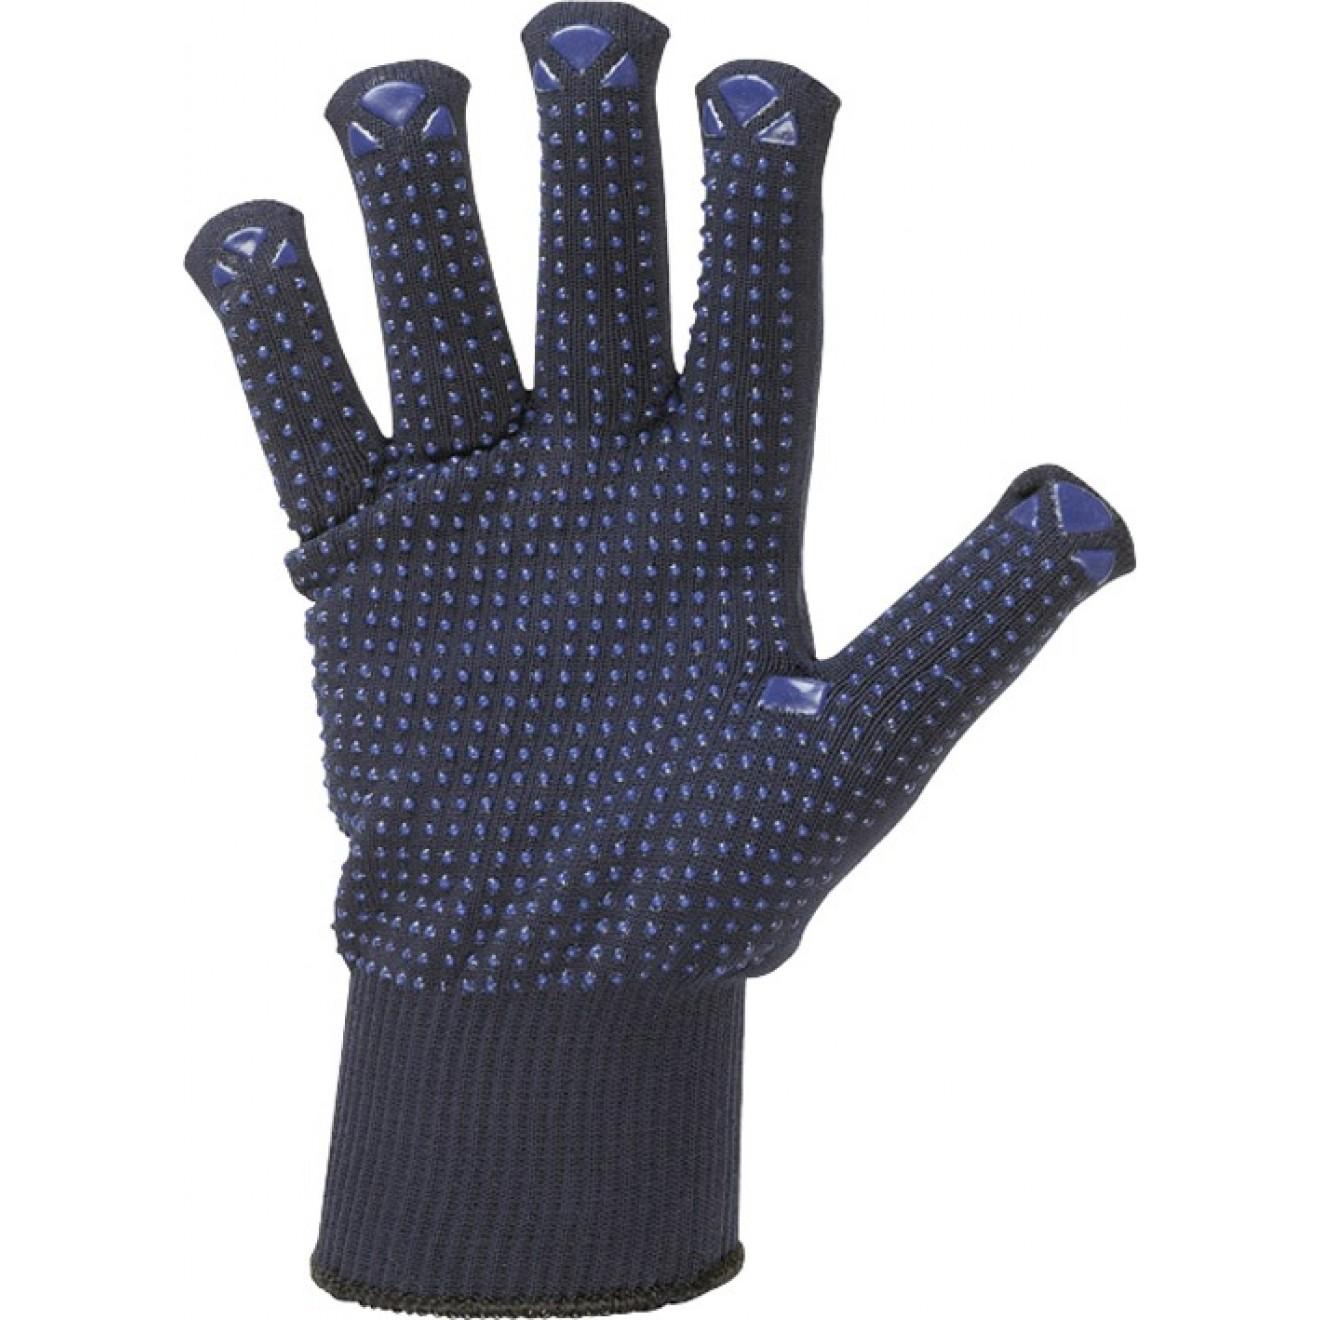 Henan Strick-Handschuh genoppt